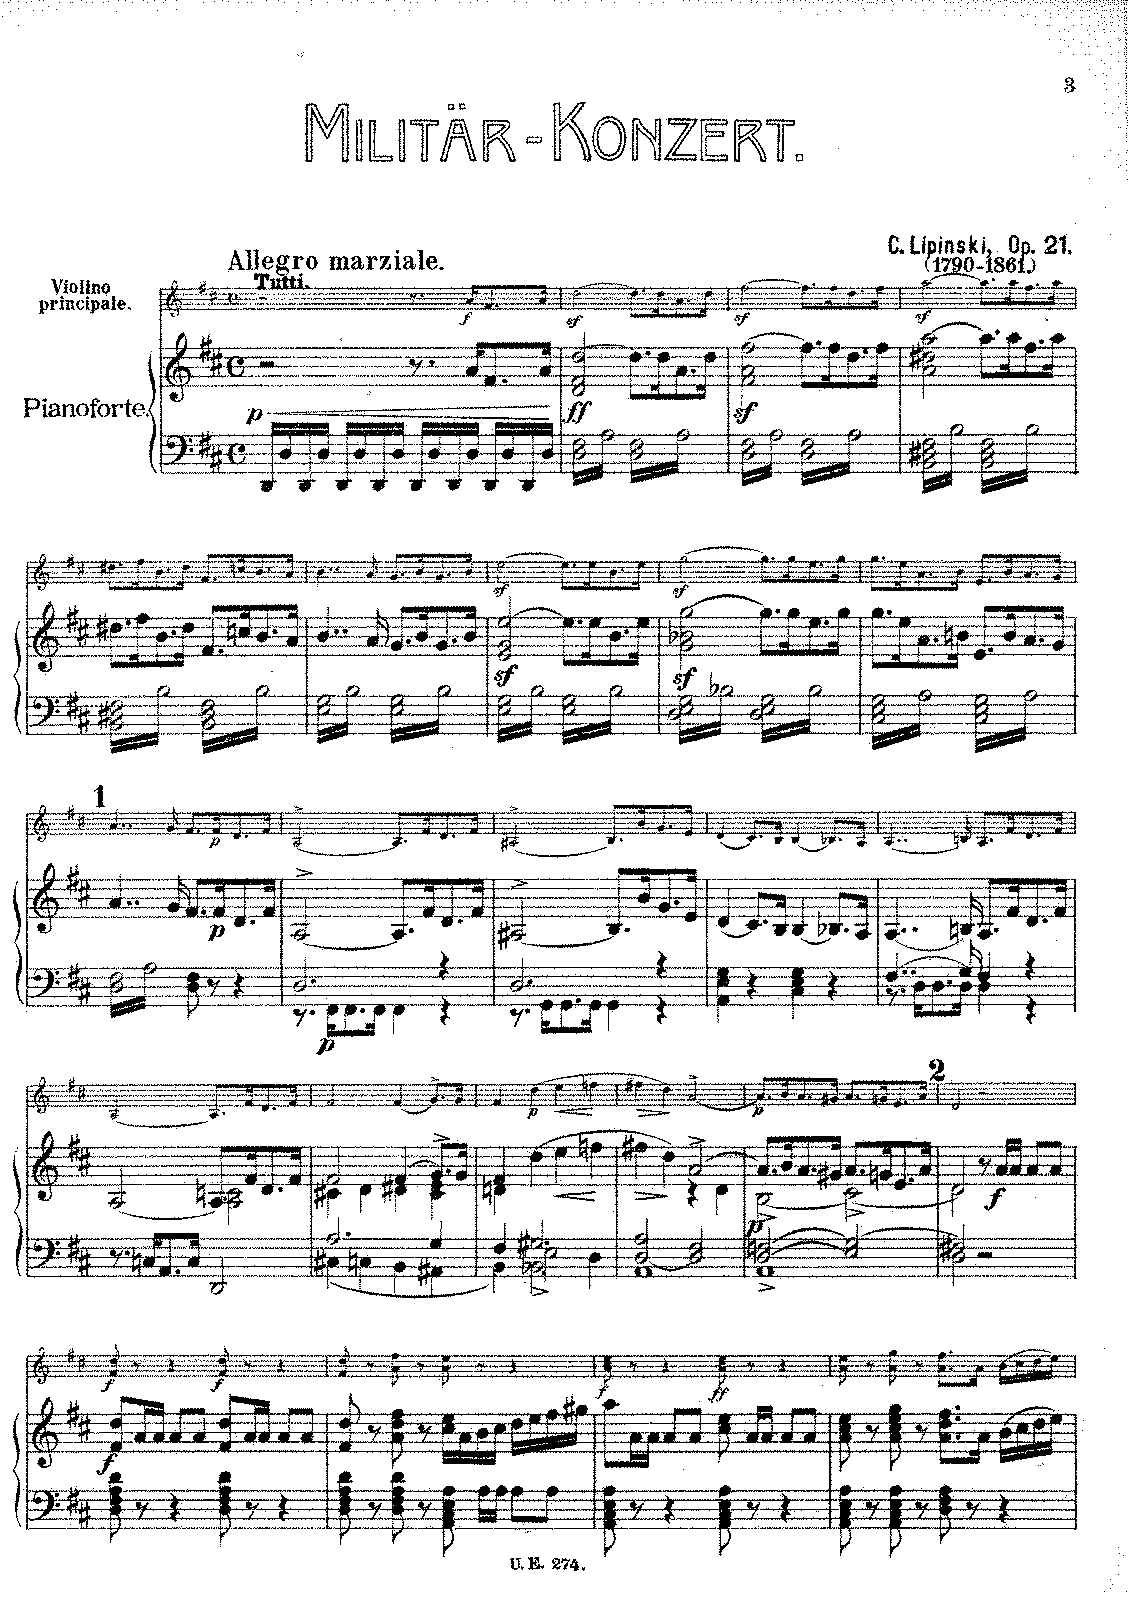 Op. 21